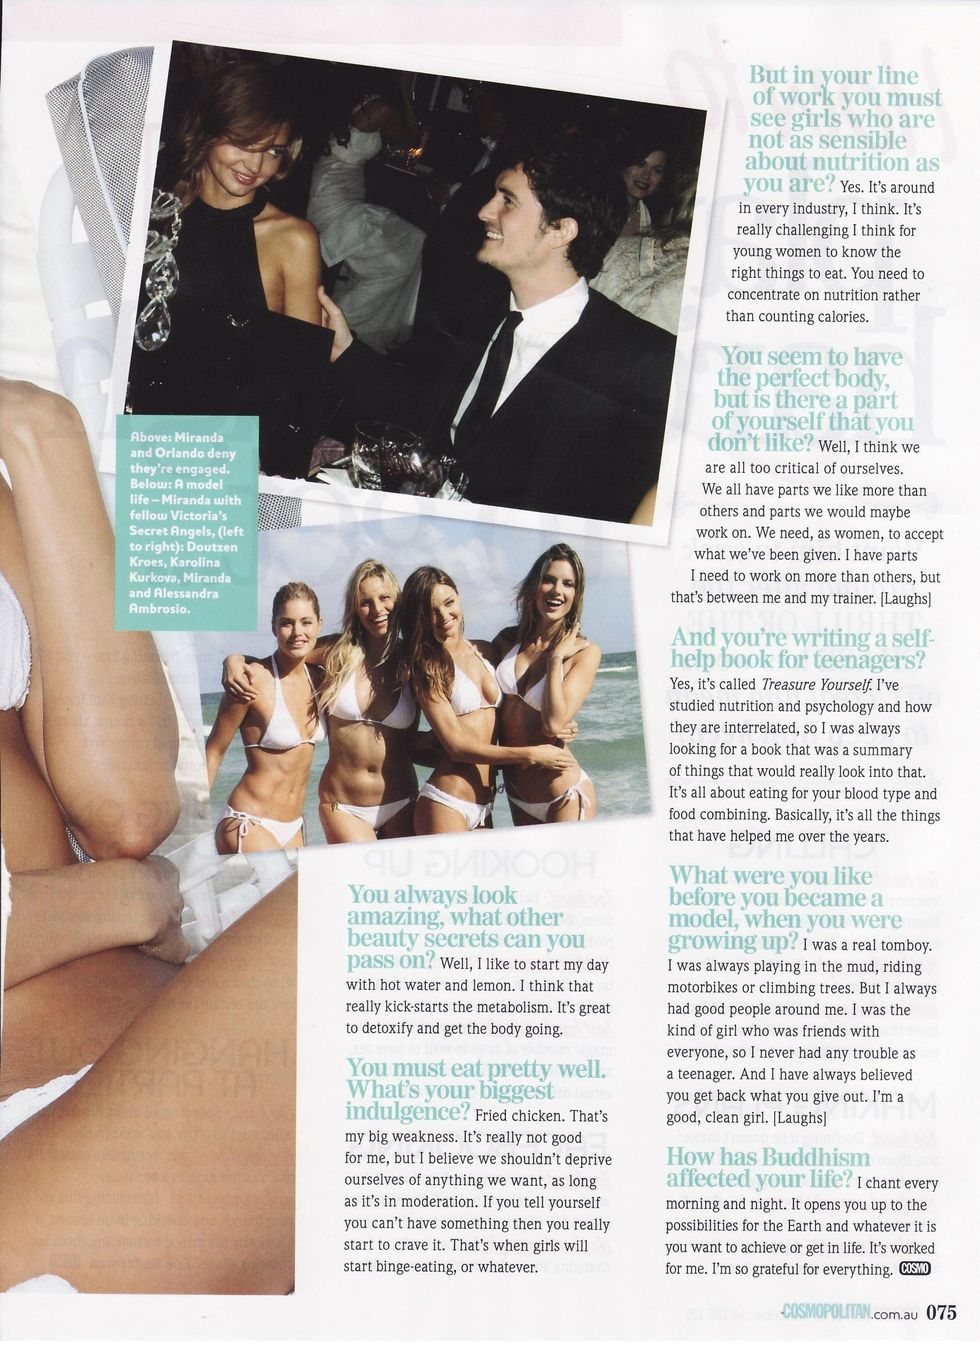 miranda-kerr-cosmopolitan-magazine-april-2009-01